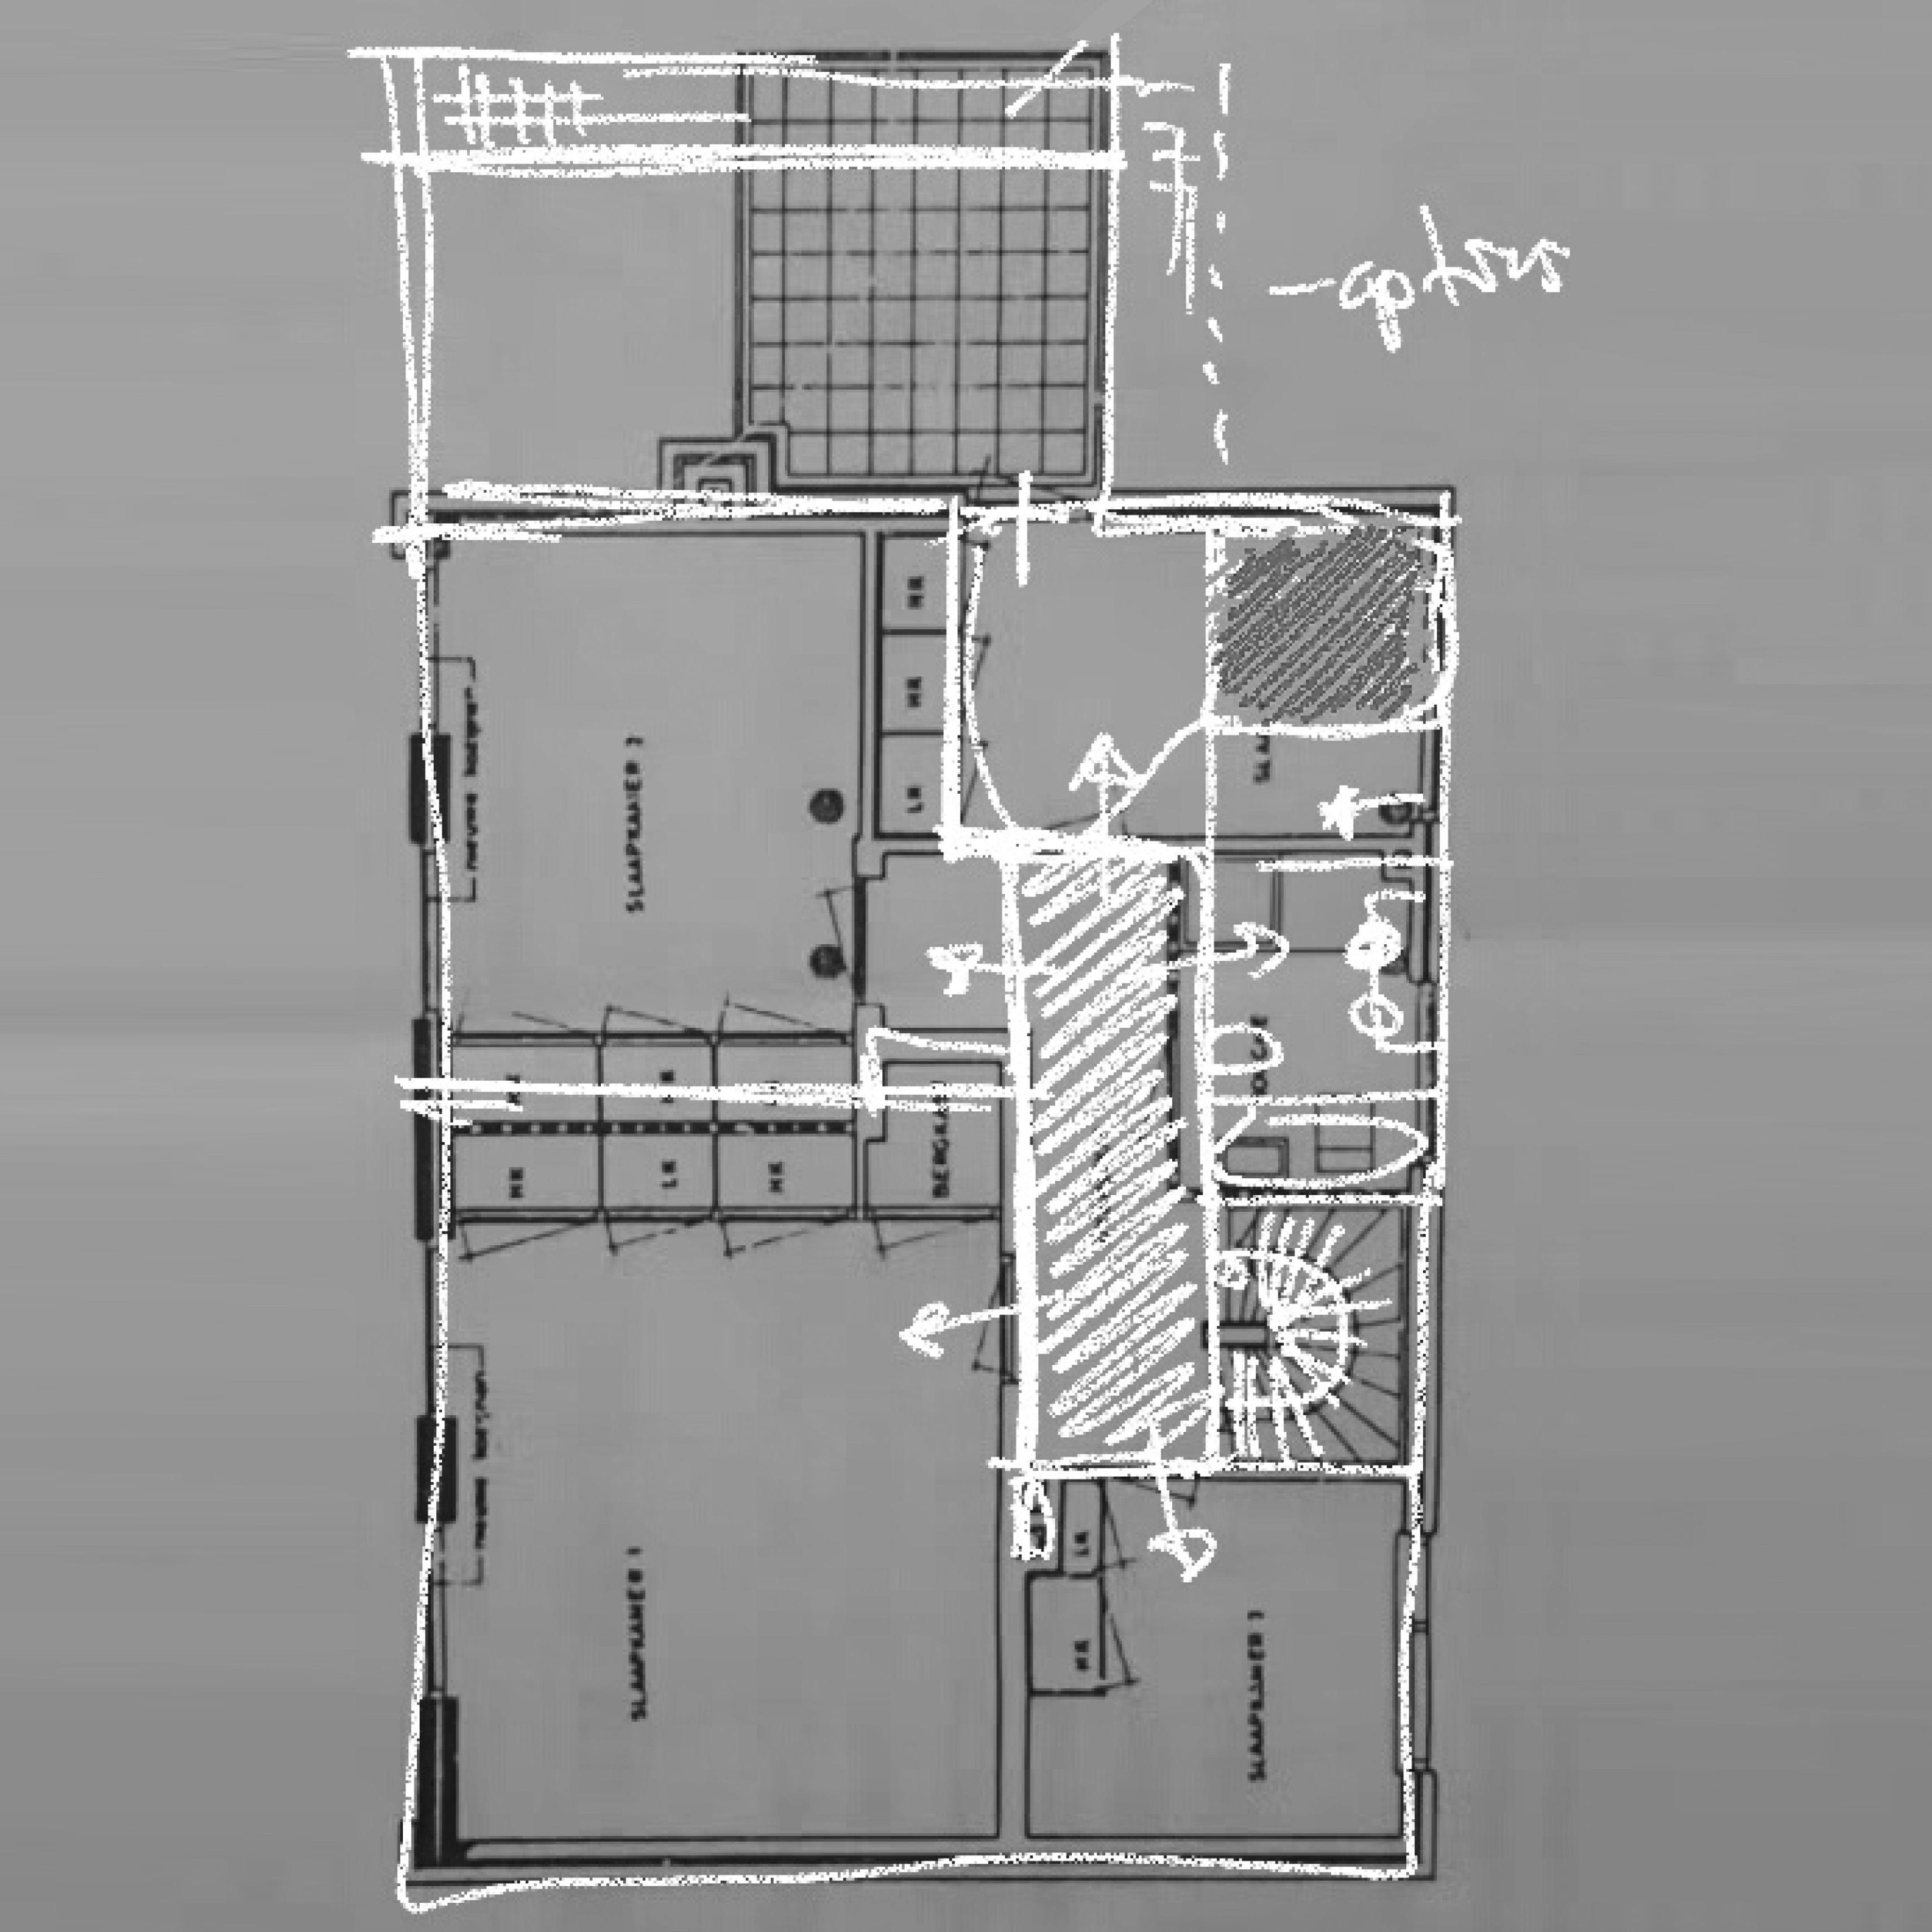 stoel_architect_kampen_stoelaantafel (5)